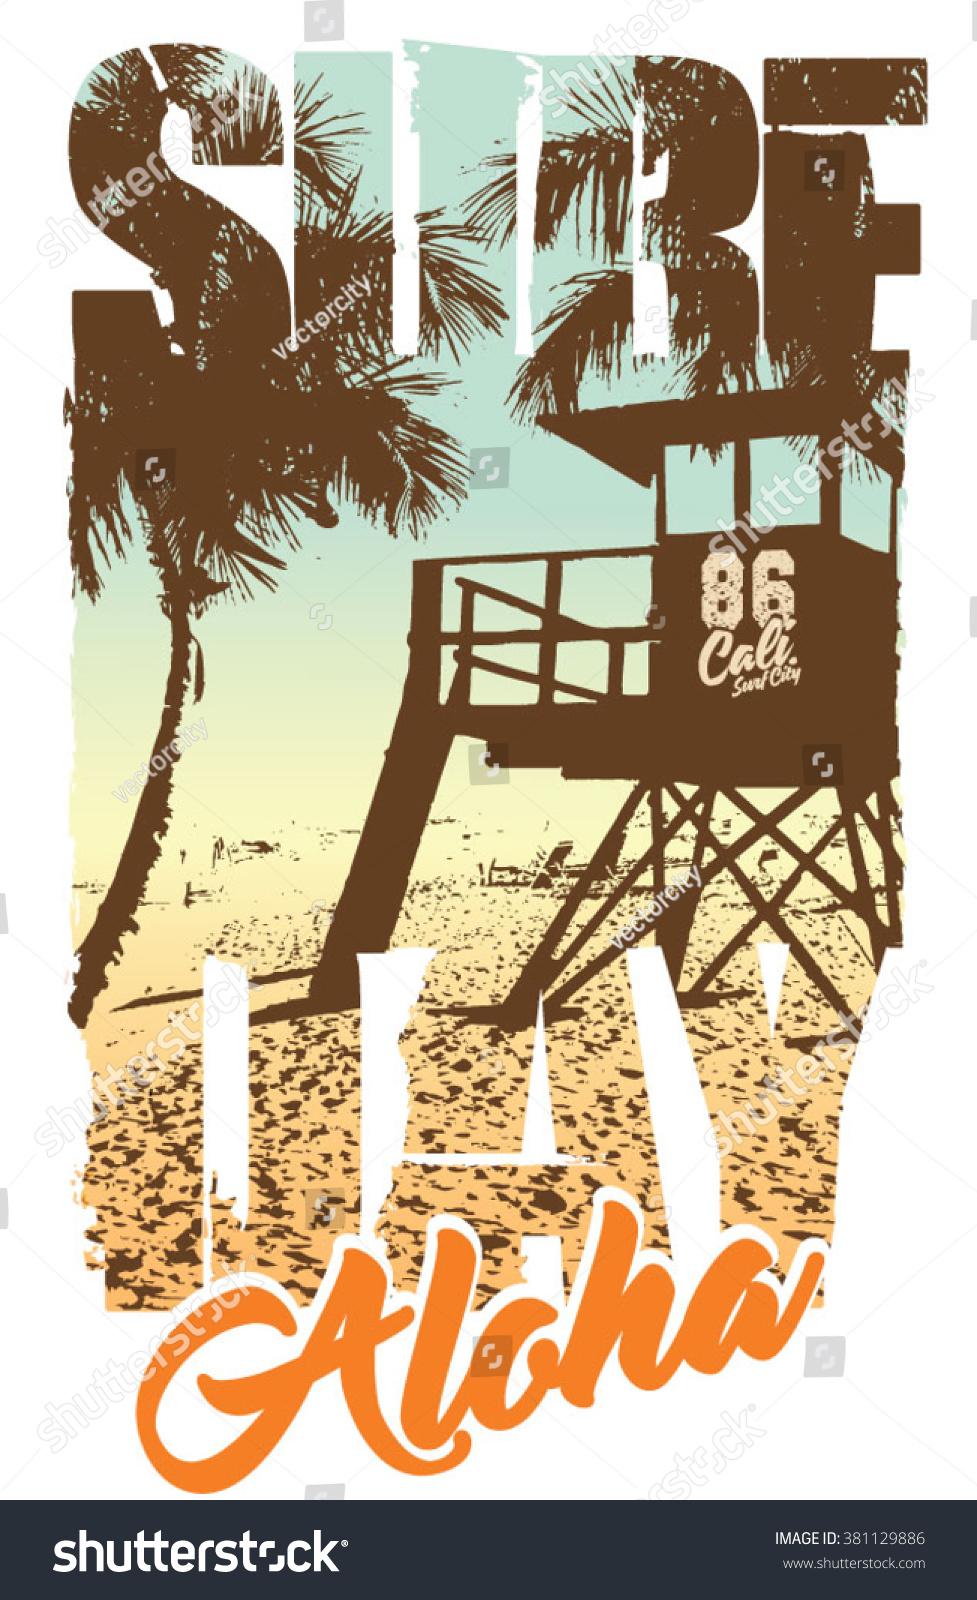 Shirt design graphics - Surf Graphic T Shirt Printing Surfing Design